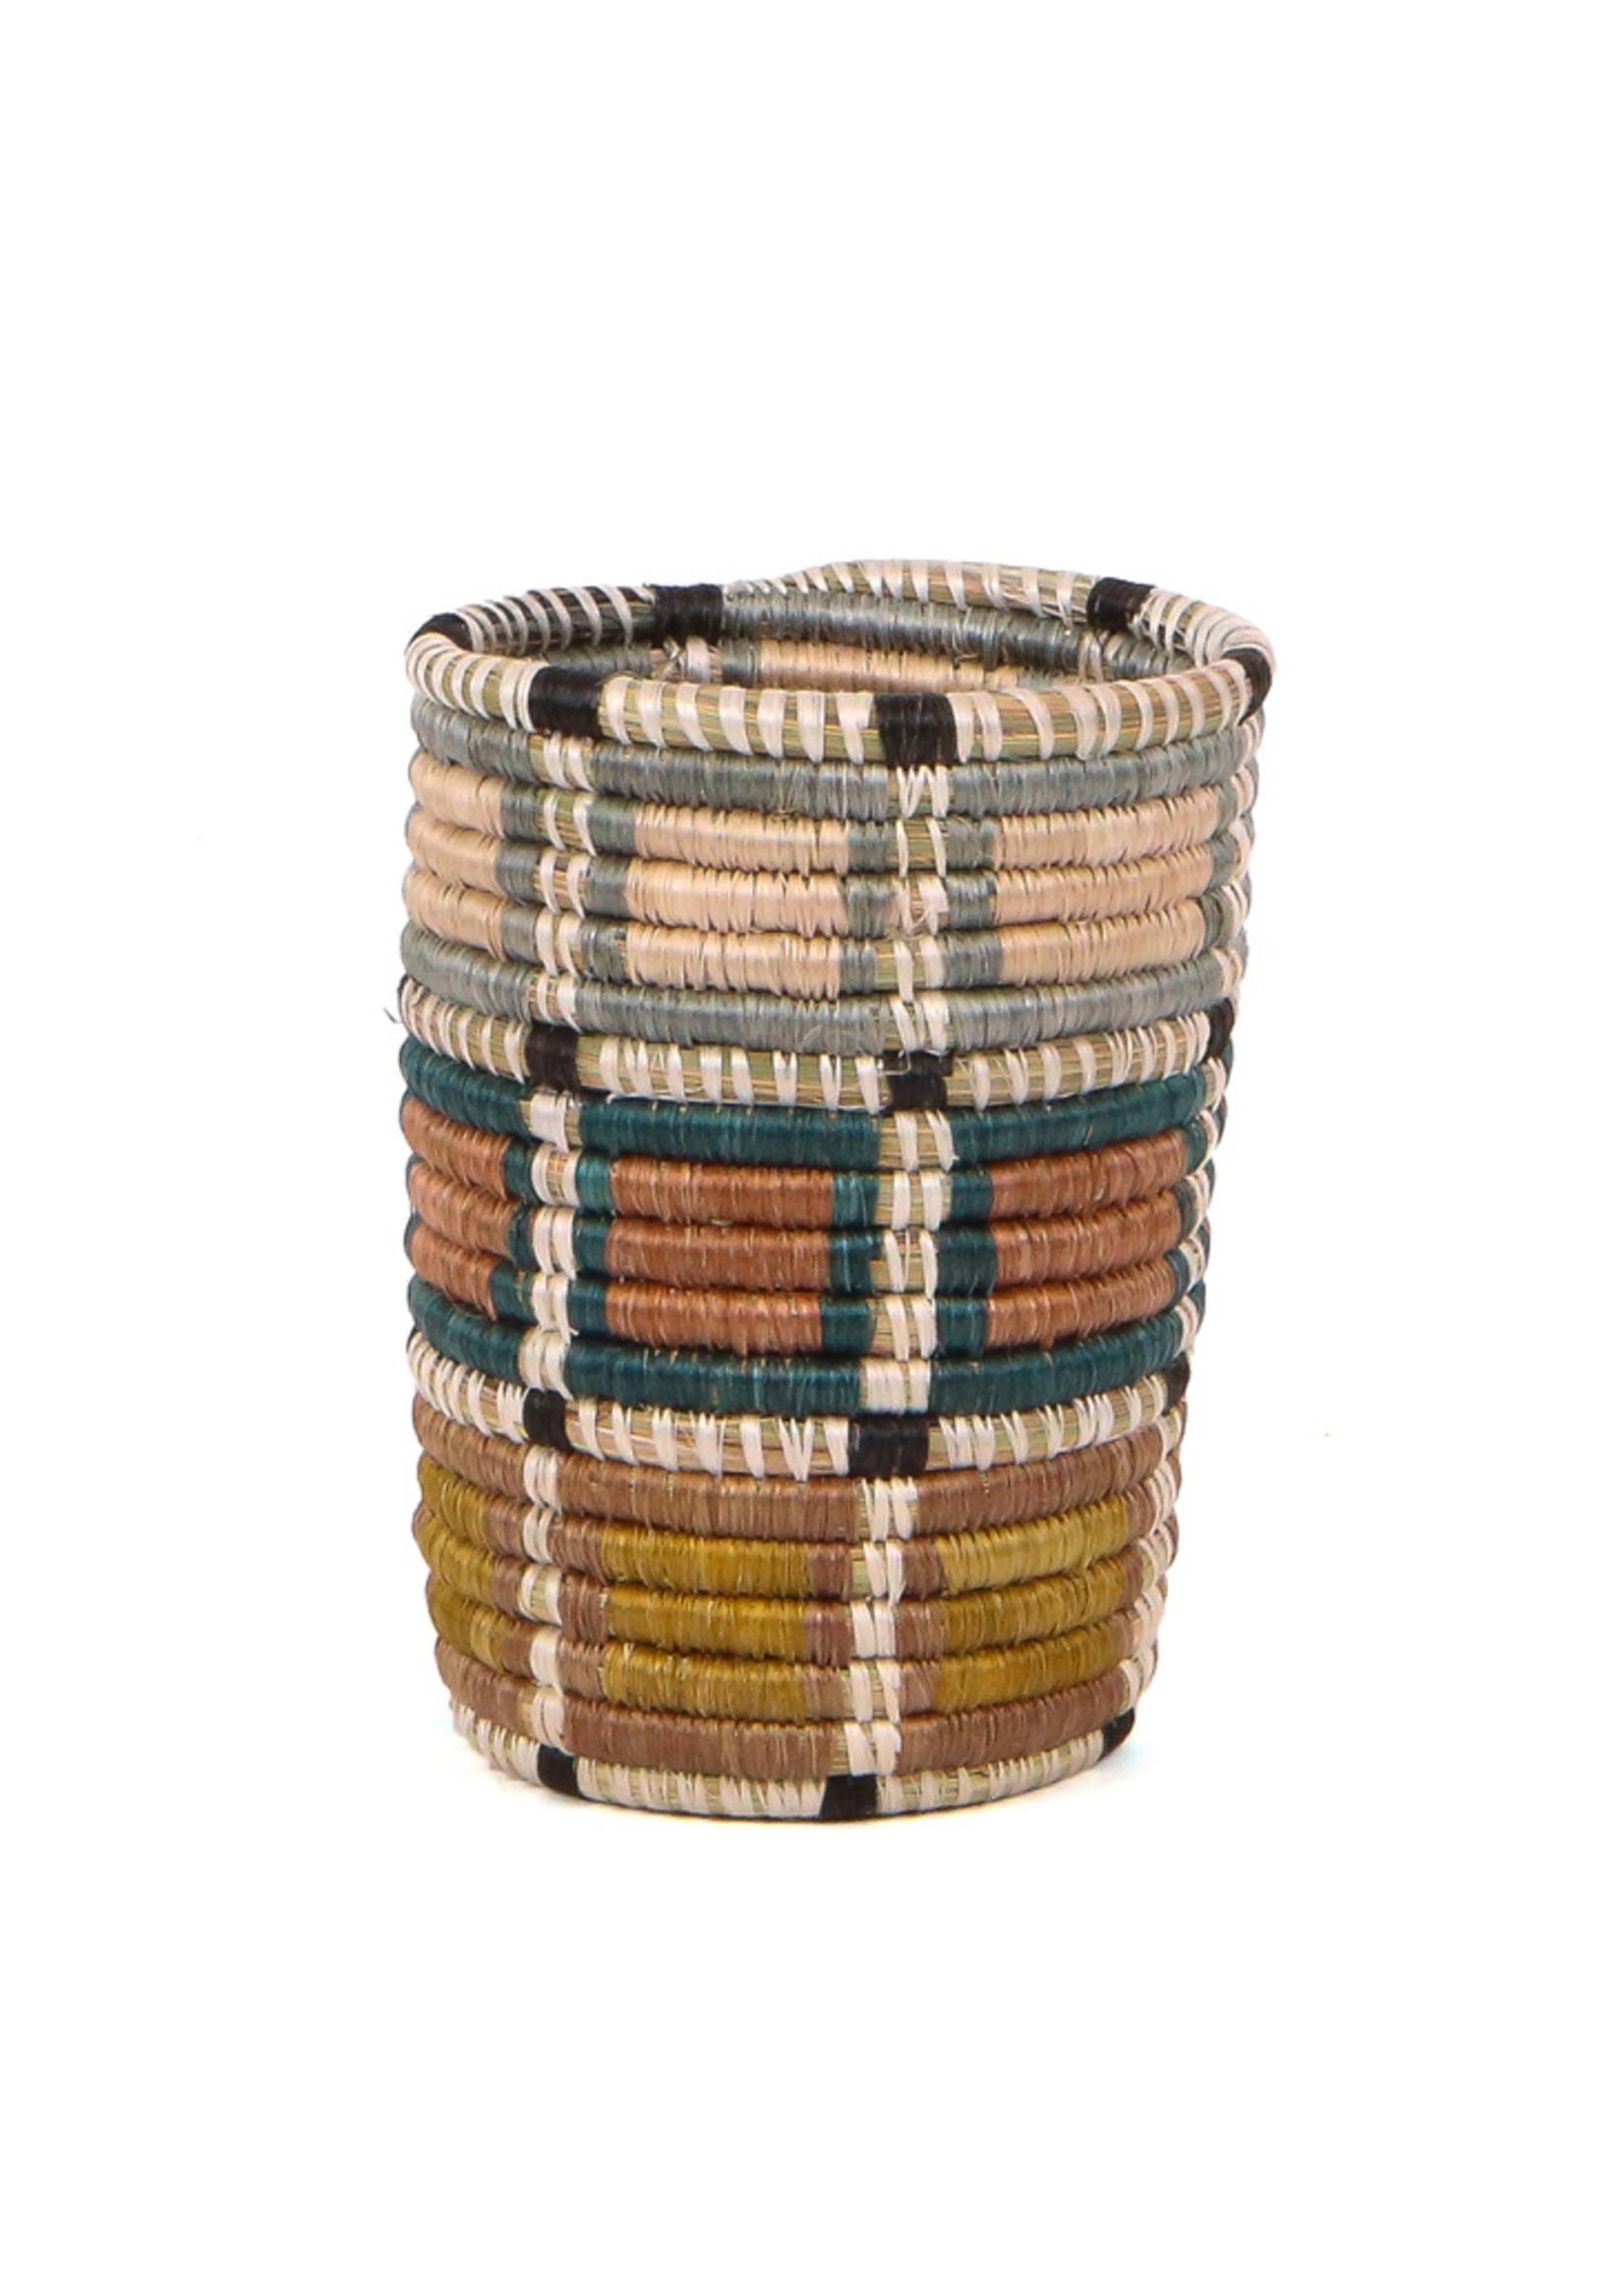 Kazi Tiny Sand Vase